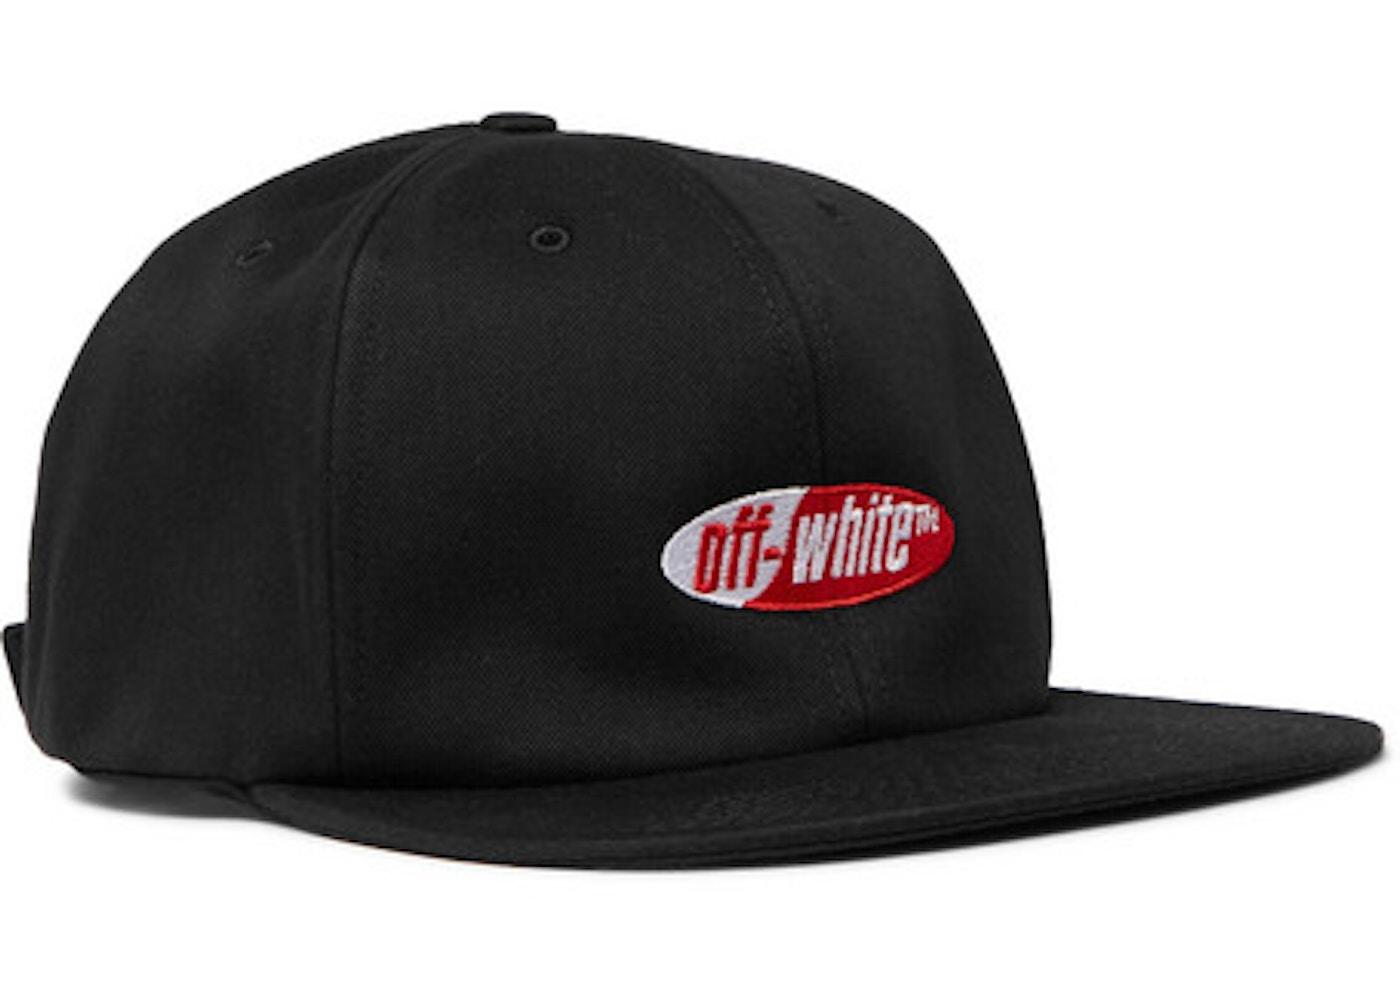 65895d8c OFF-WHITE Logo Embroidered Baseball Hat Black - SS19